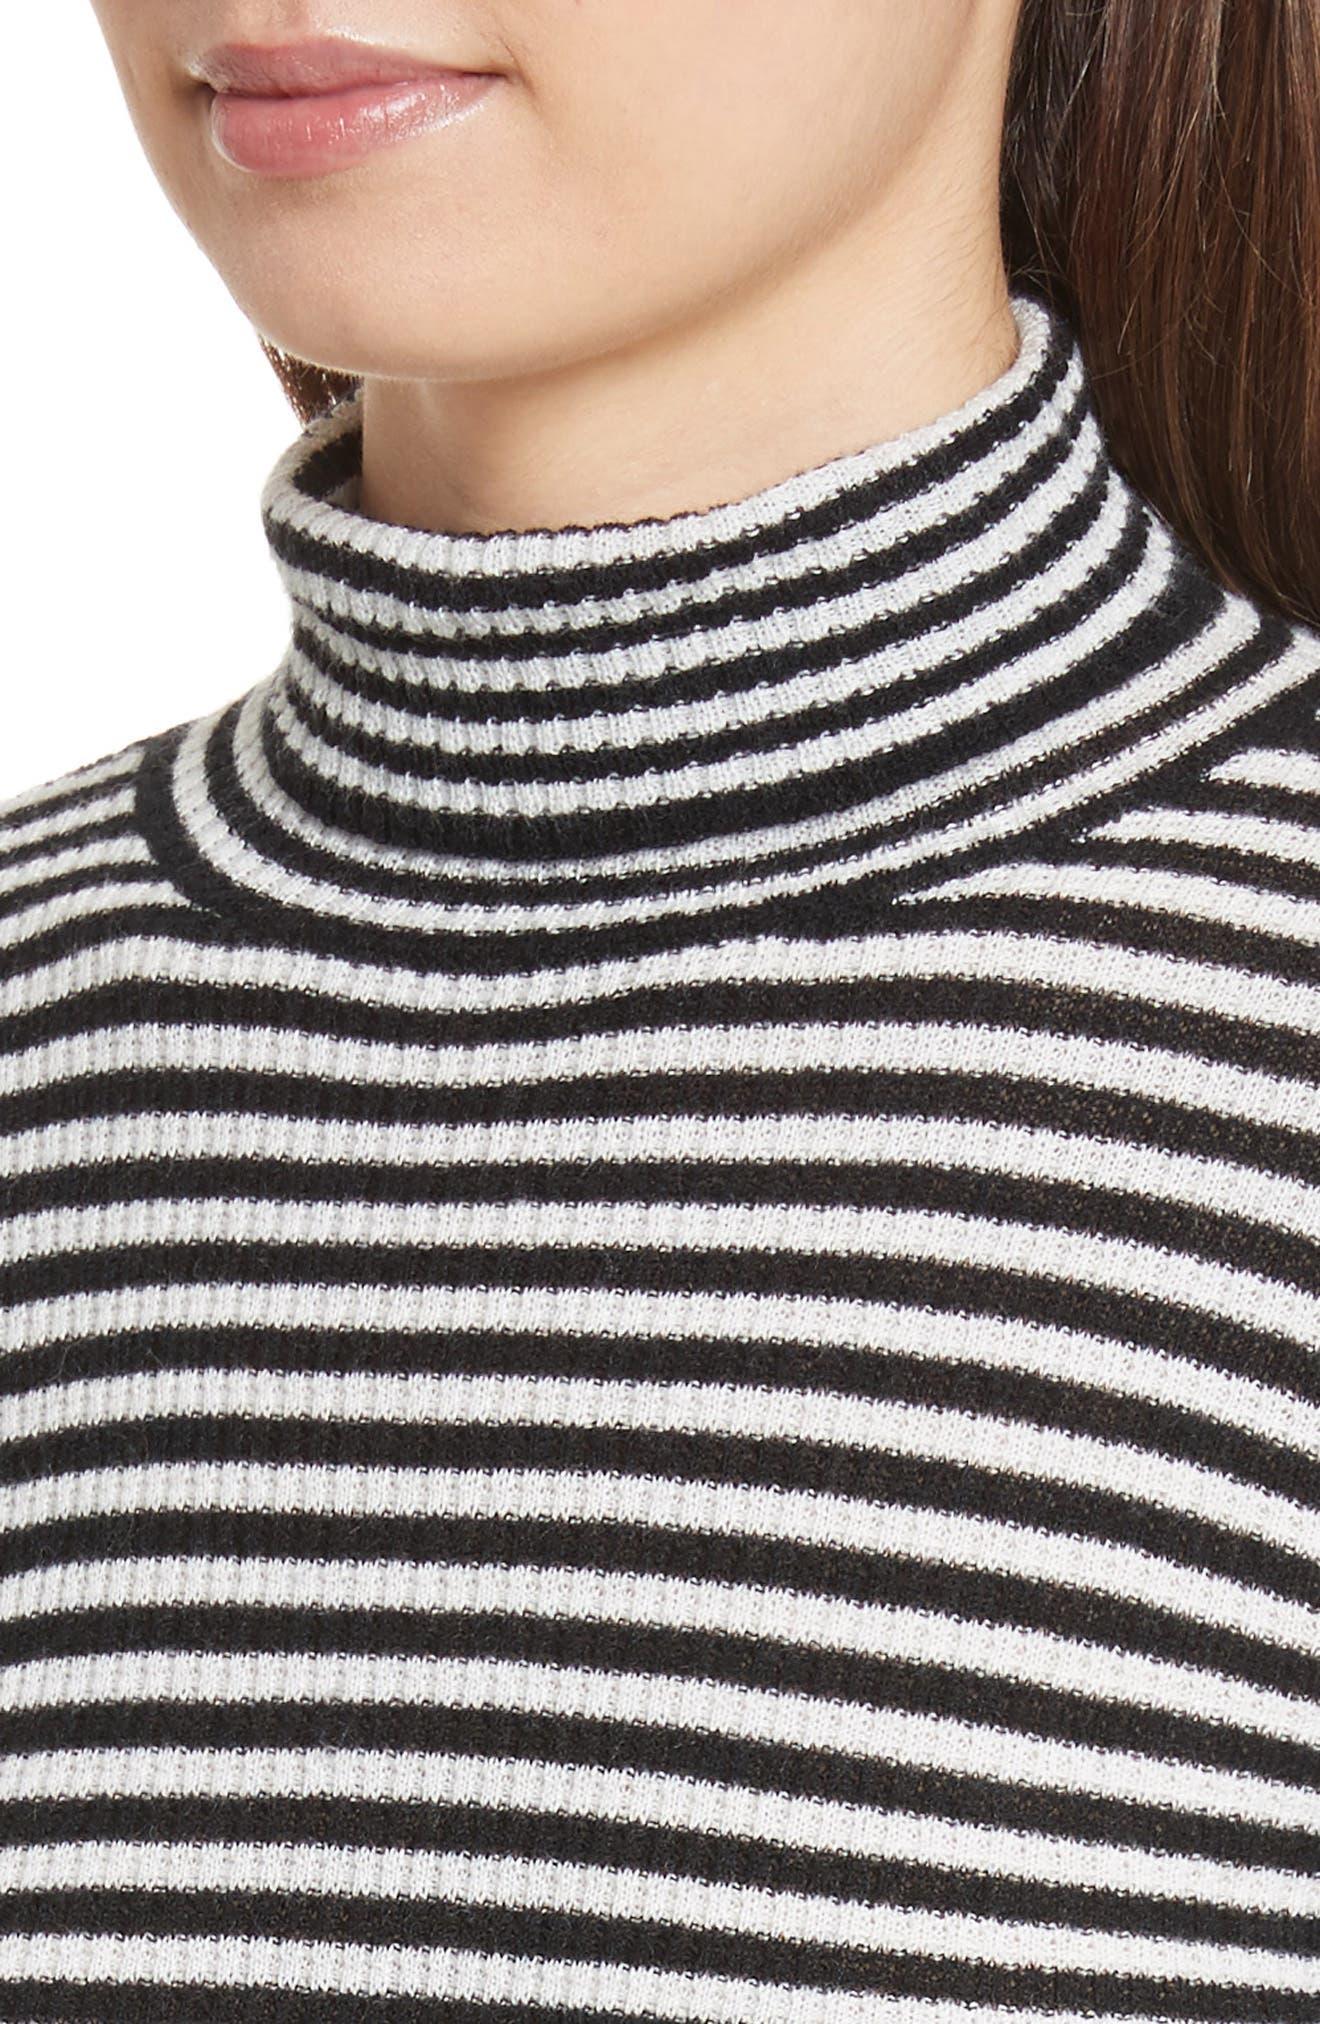 Zelene Stripe Cowl Neck Sweater,                             Alternate thumbnail 4, color,                             Caviar/ Porceclain